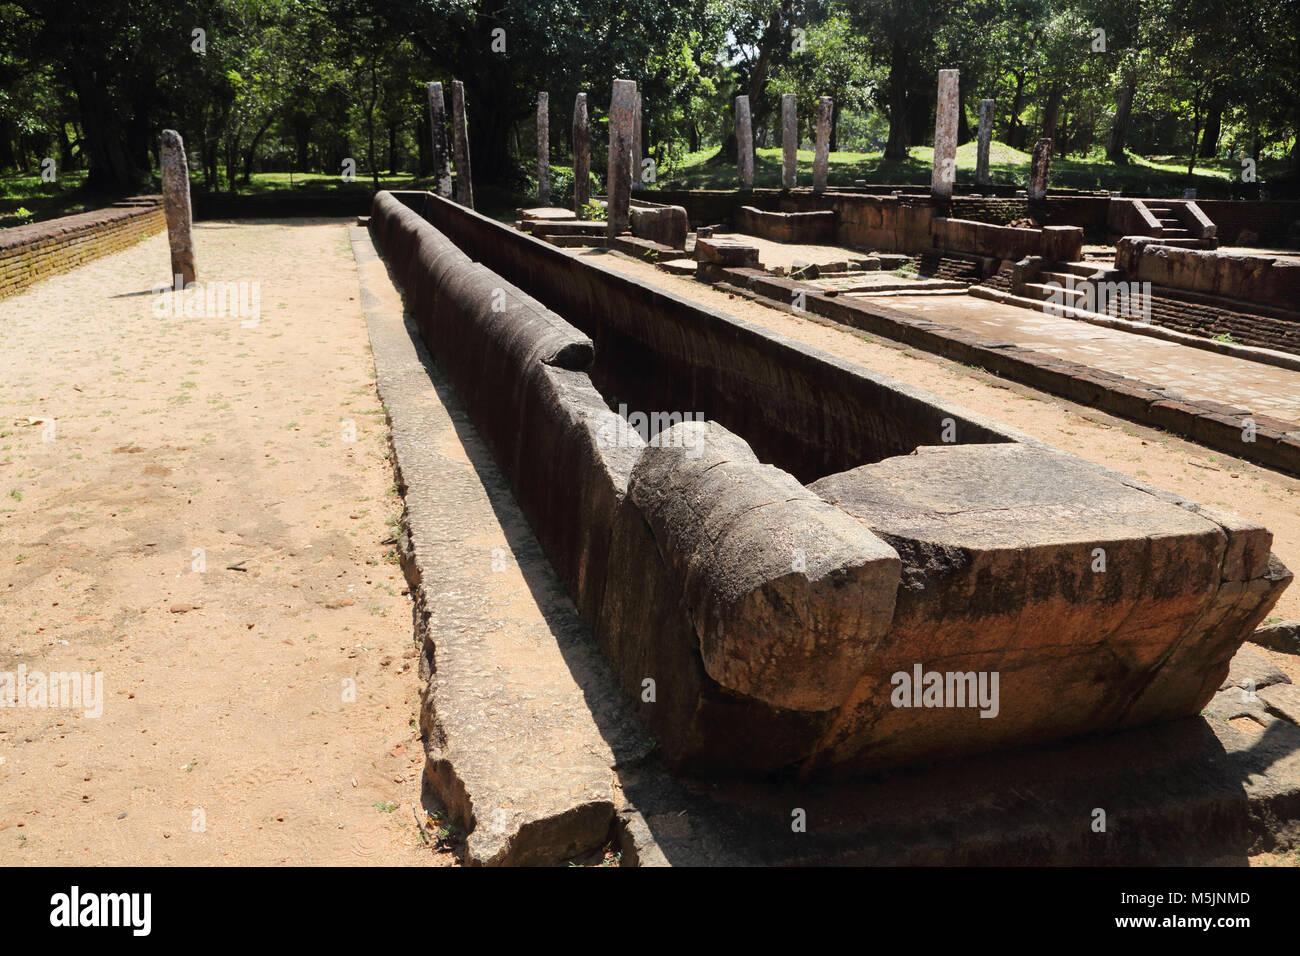 Anuradhapura North Central Province Sri Lanka Réfectoire Monastère Abhayagiri Ruins Banque D'Images